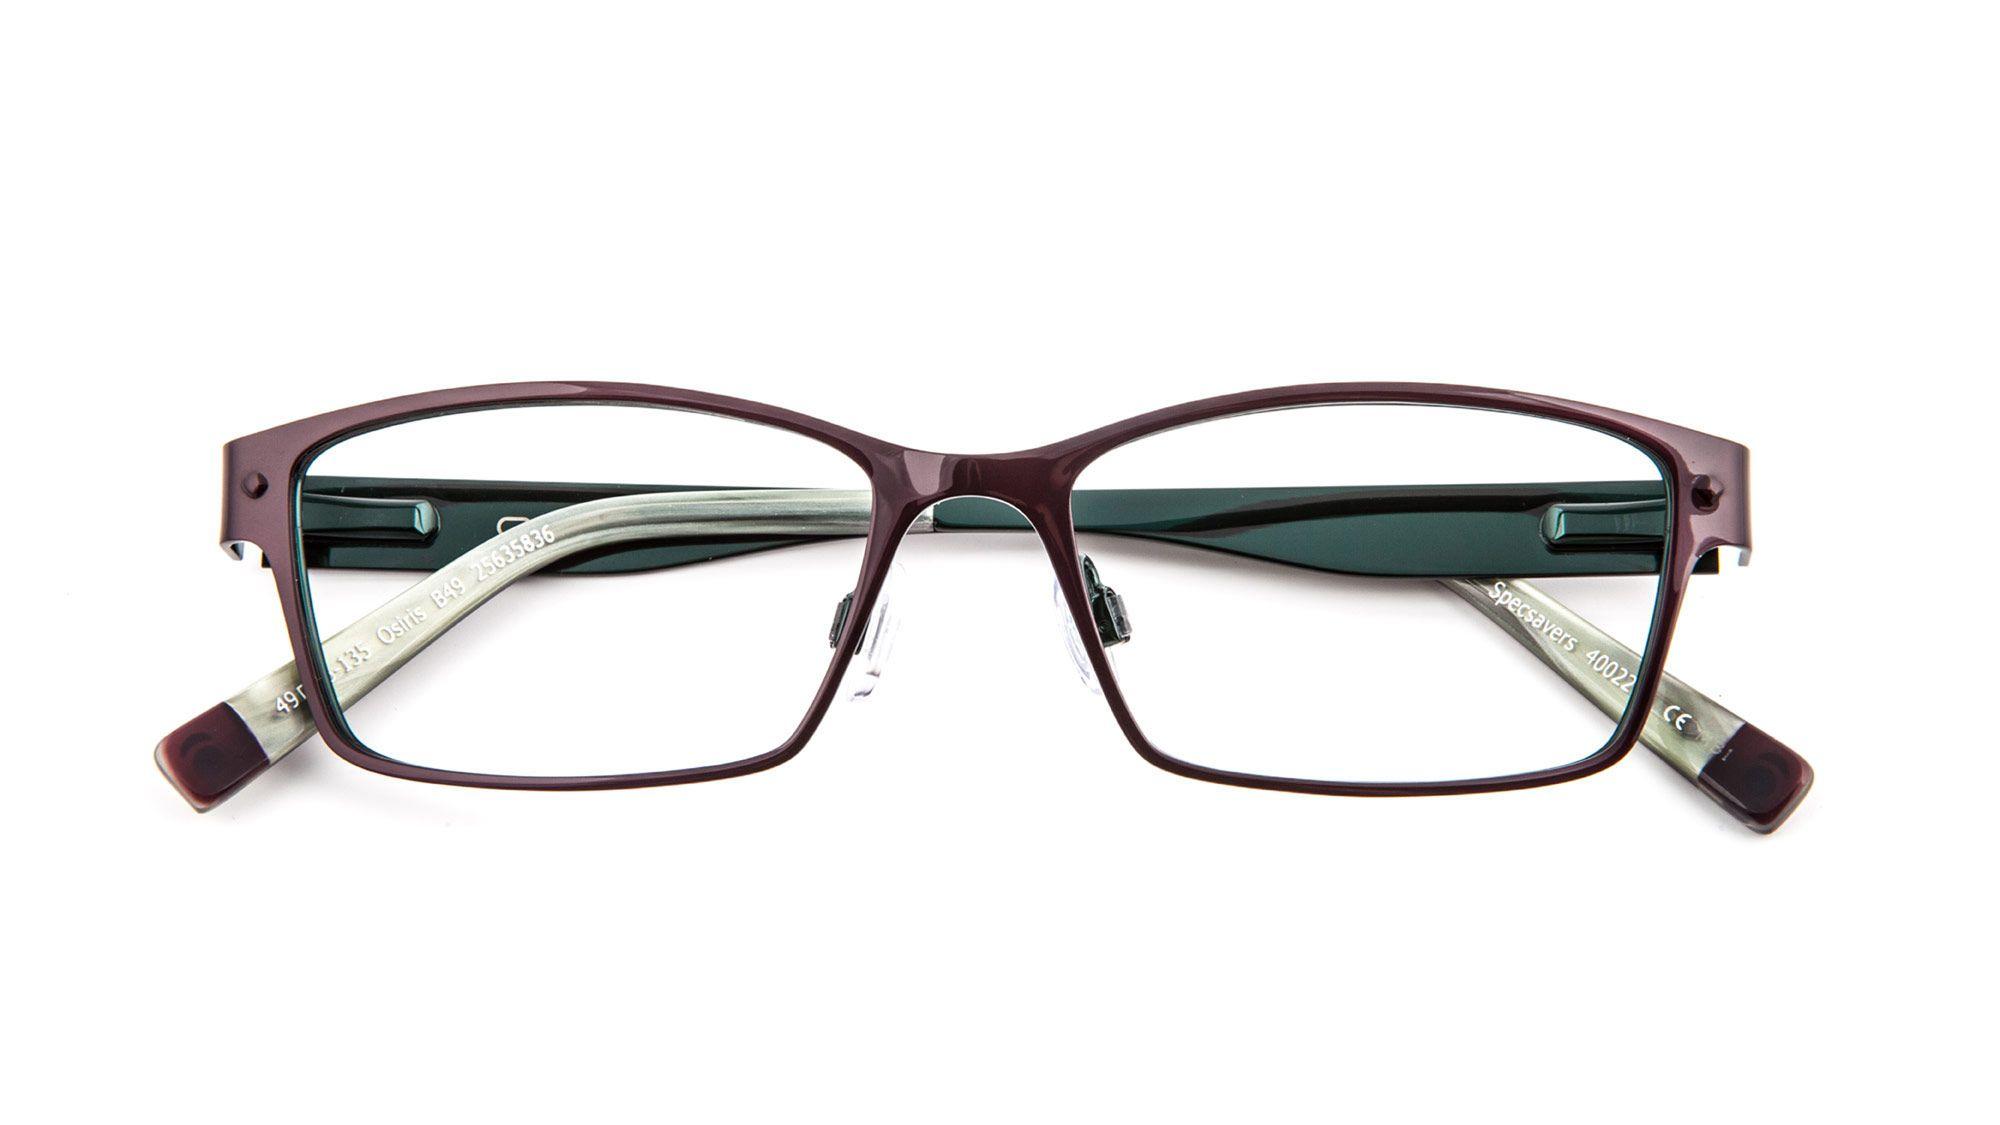 Specsavers Optometrists Designer Glasses, Sunglasses